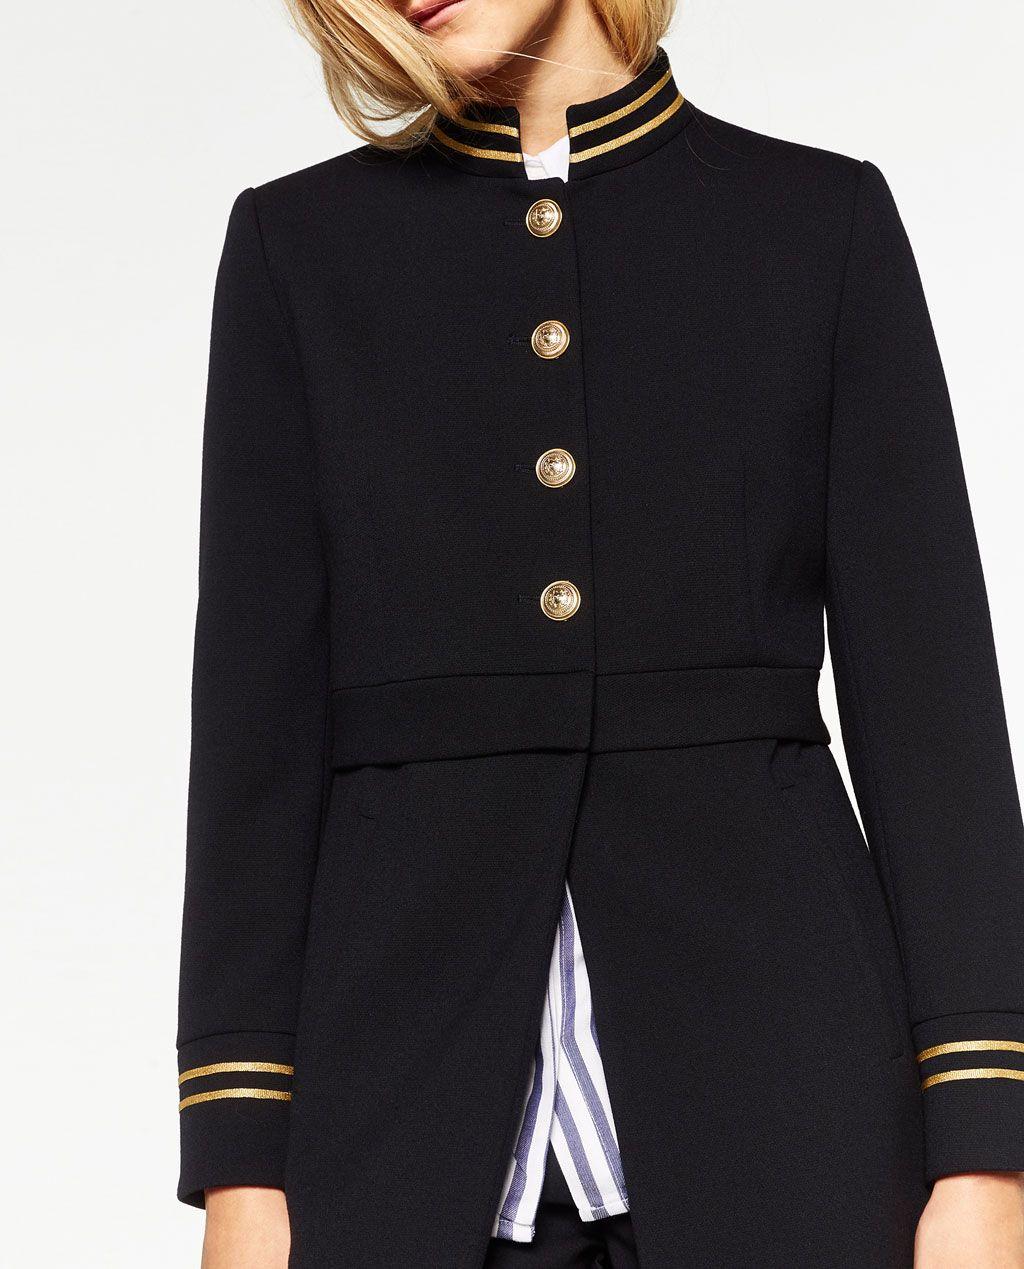 2019 Levita Jackets Y Cuello En Moda Coat Mao Zara Bwxztwq6